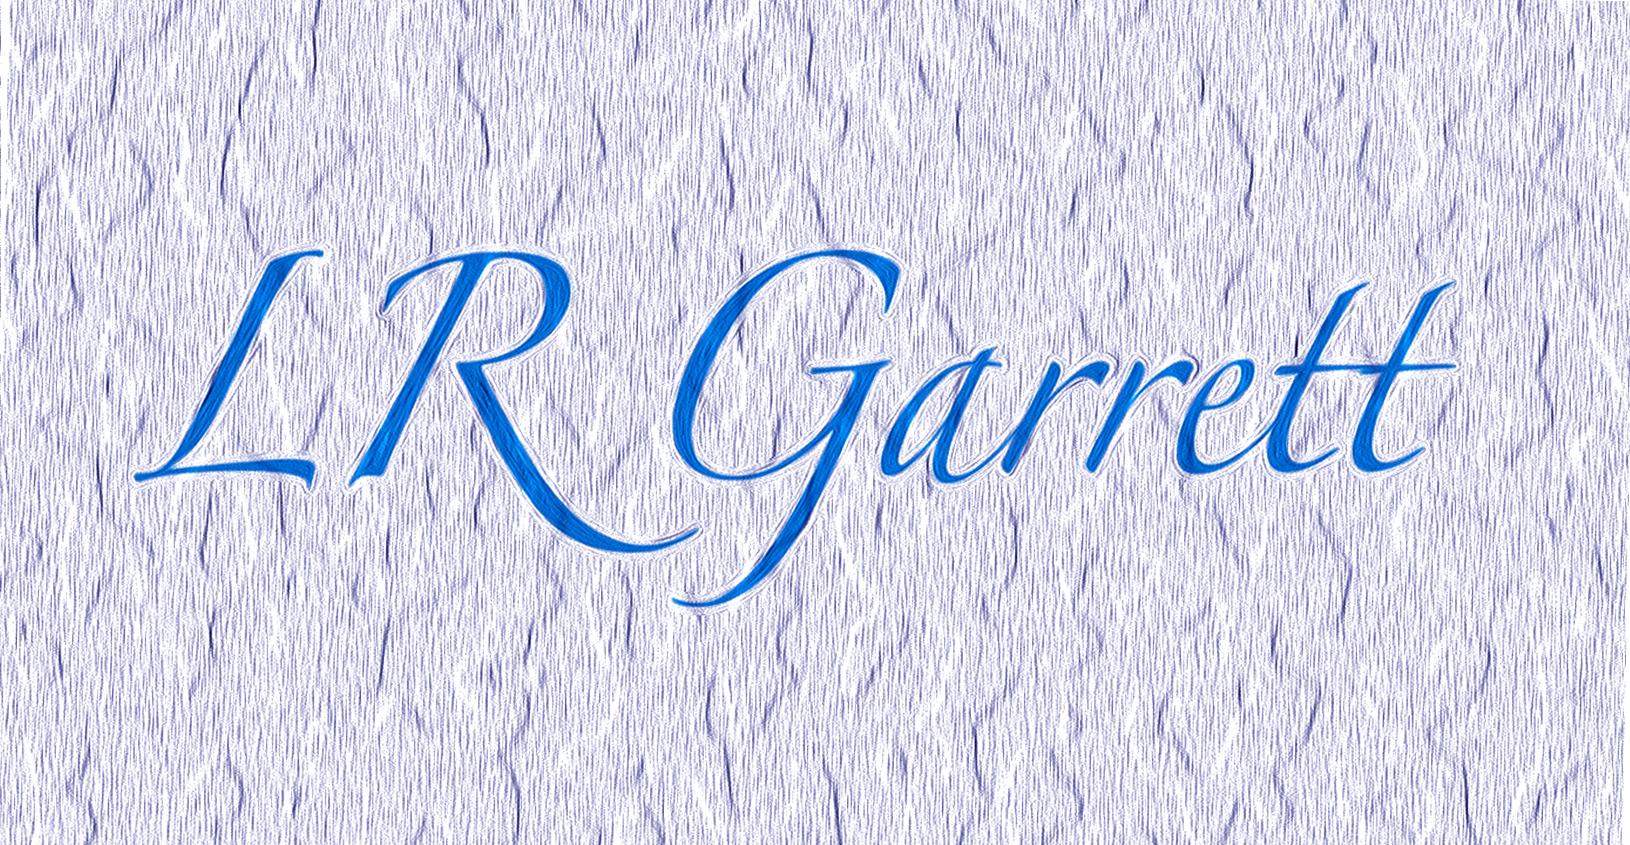 les garrett Signature